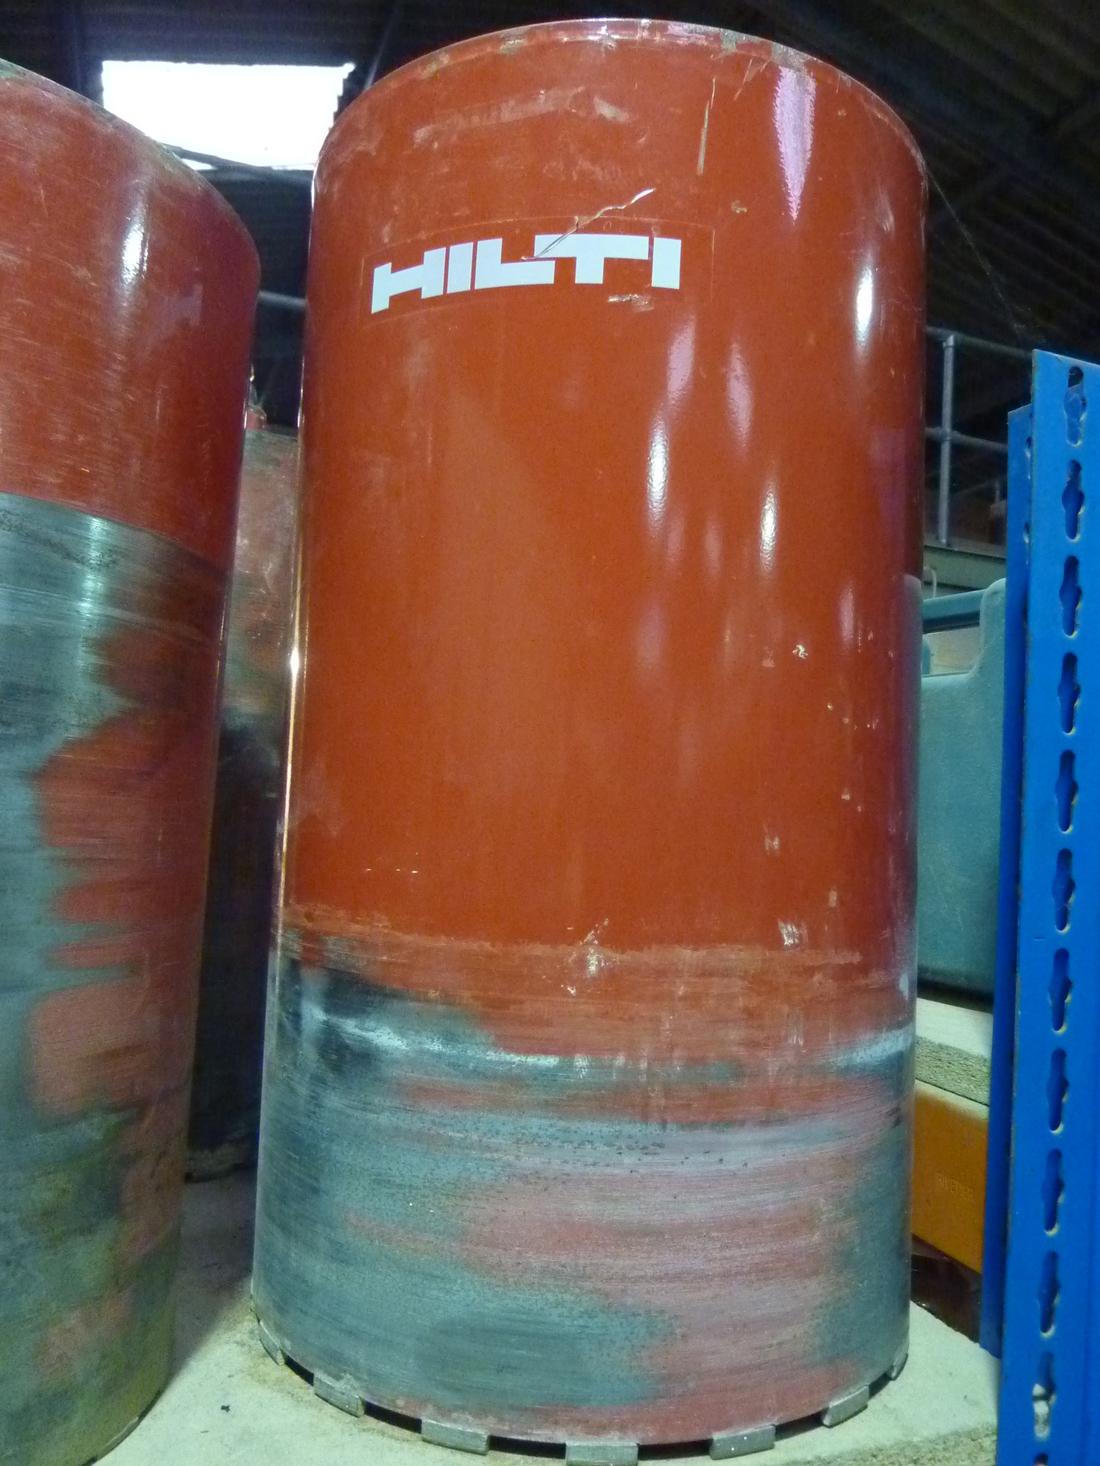 Hilti DD130 Wet Diamond Core 62mm